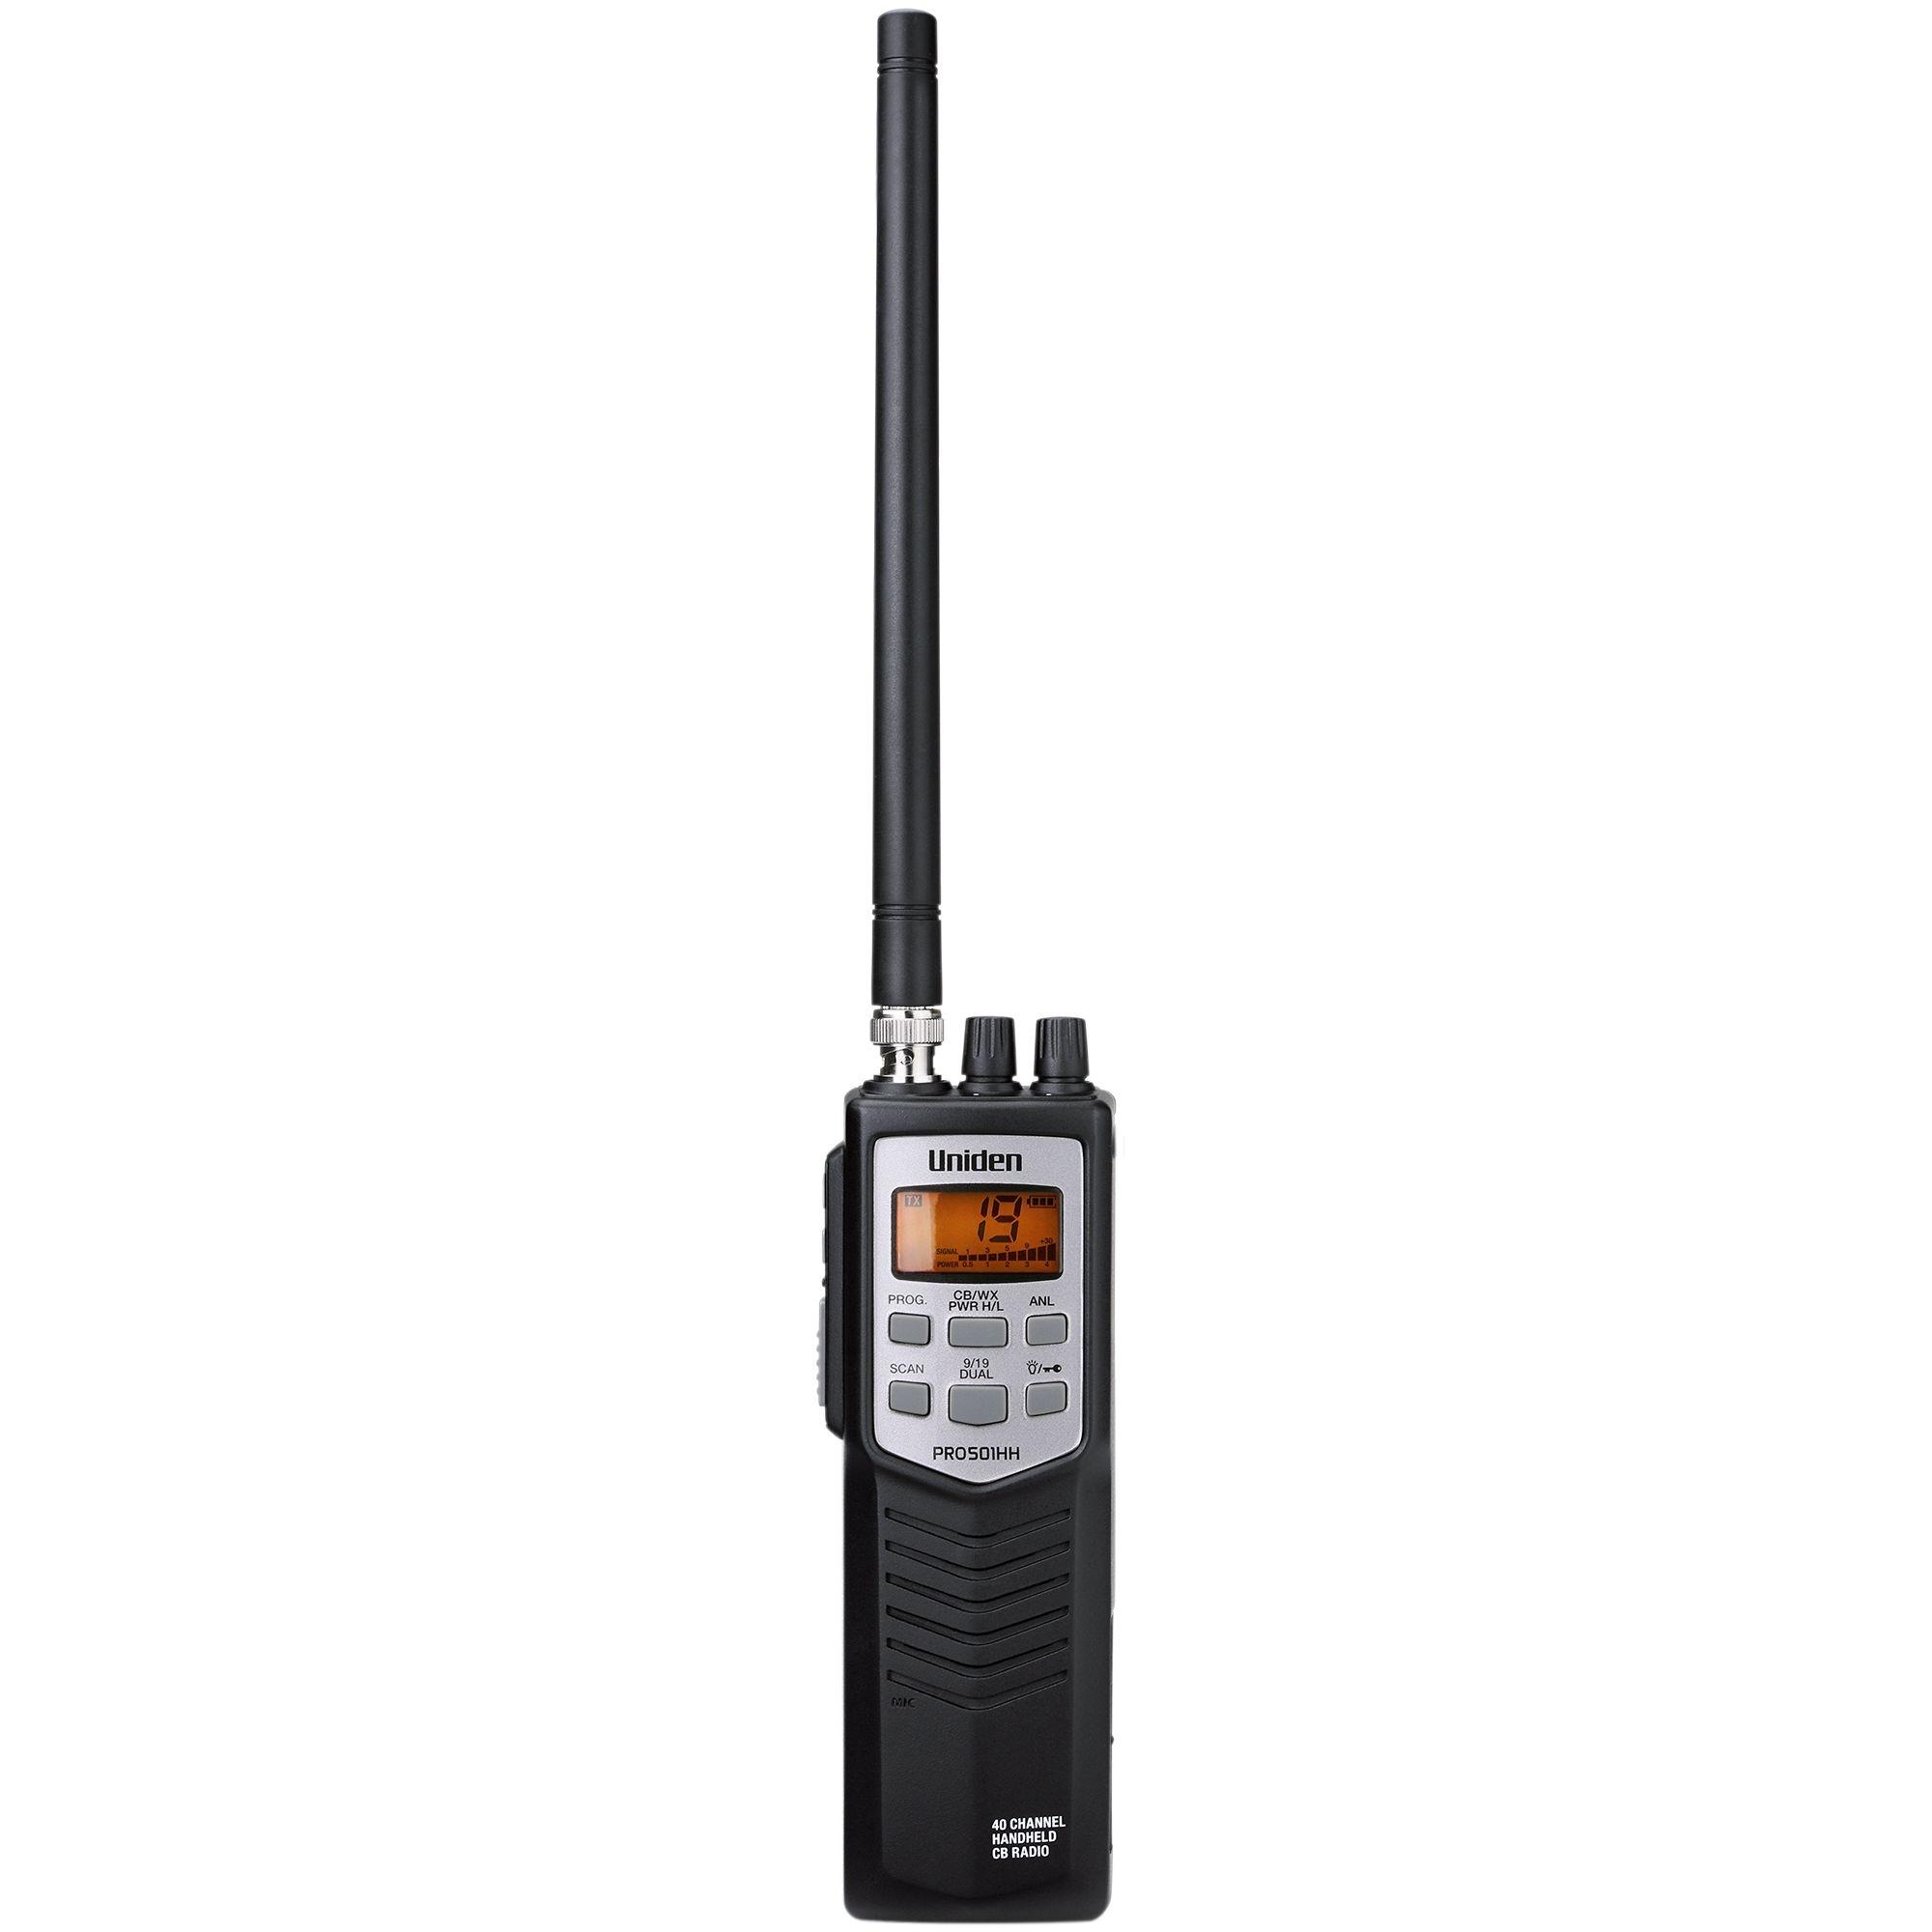 PRO501HH - Uniden Compact 40 Channel Handheld CB Radio